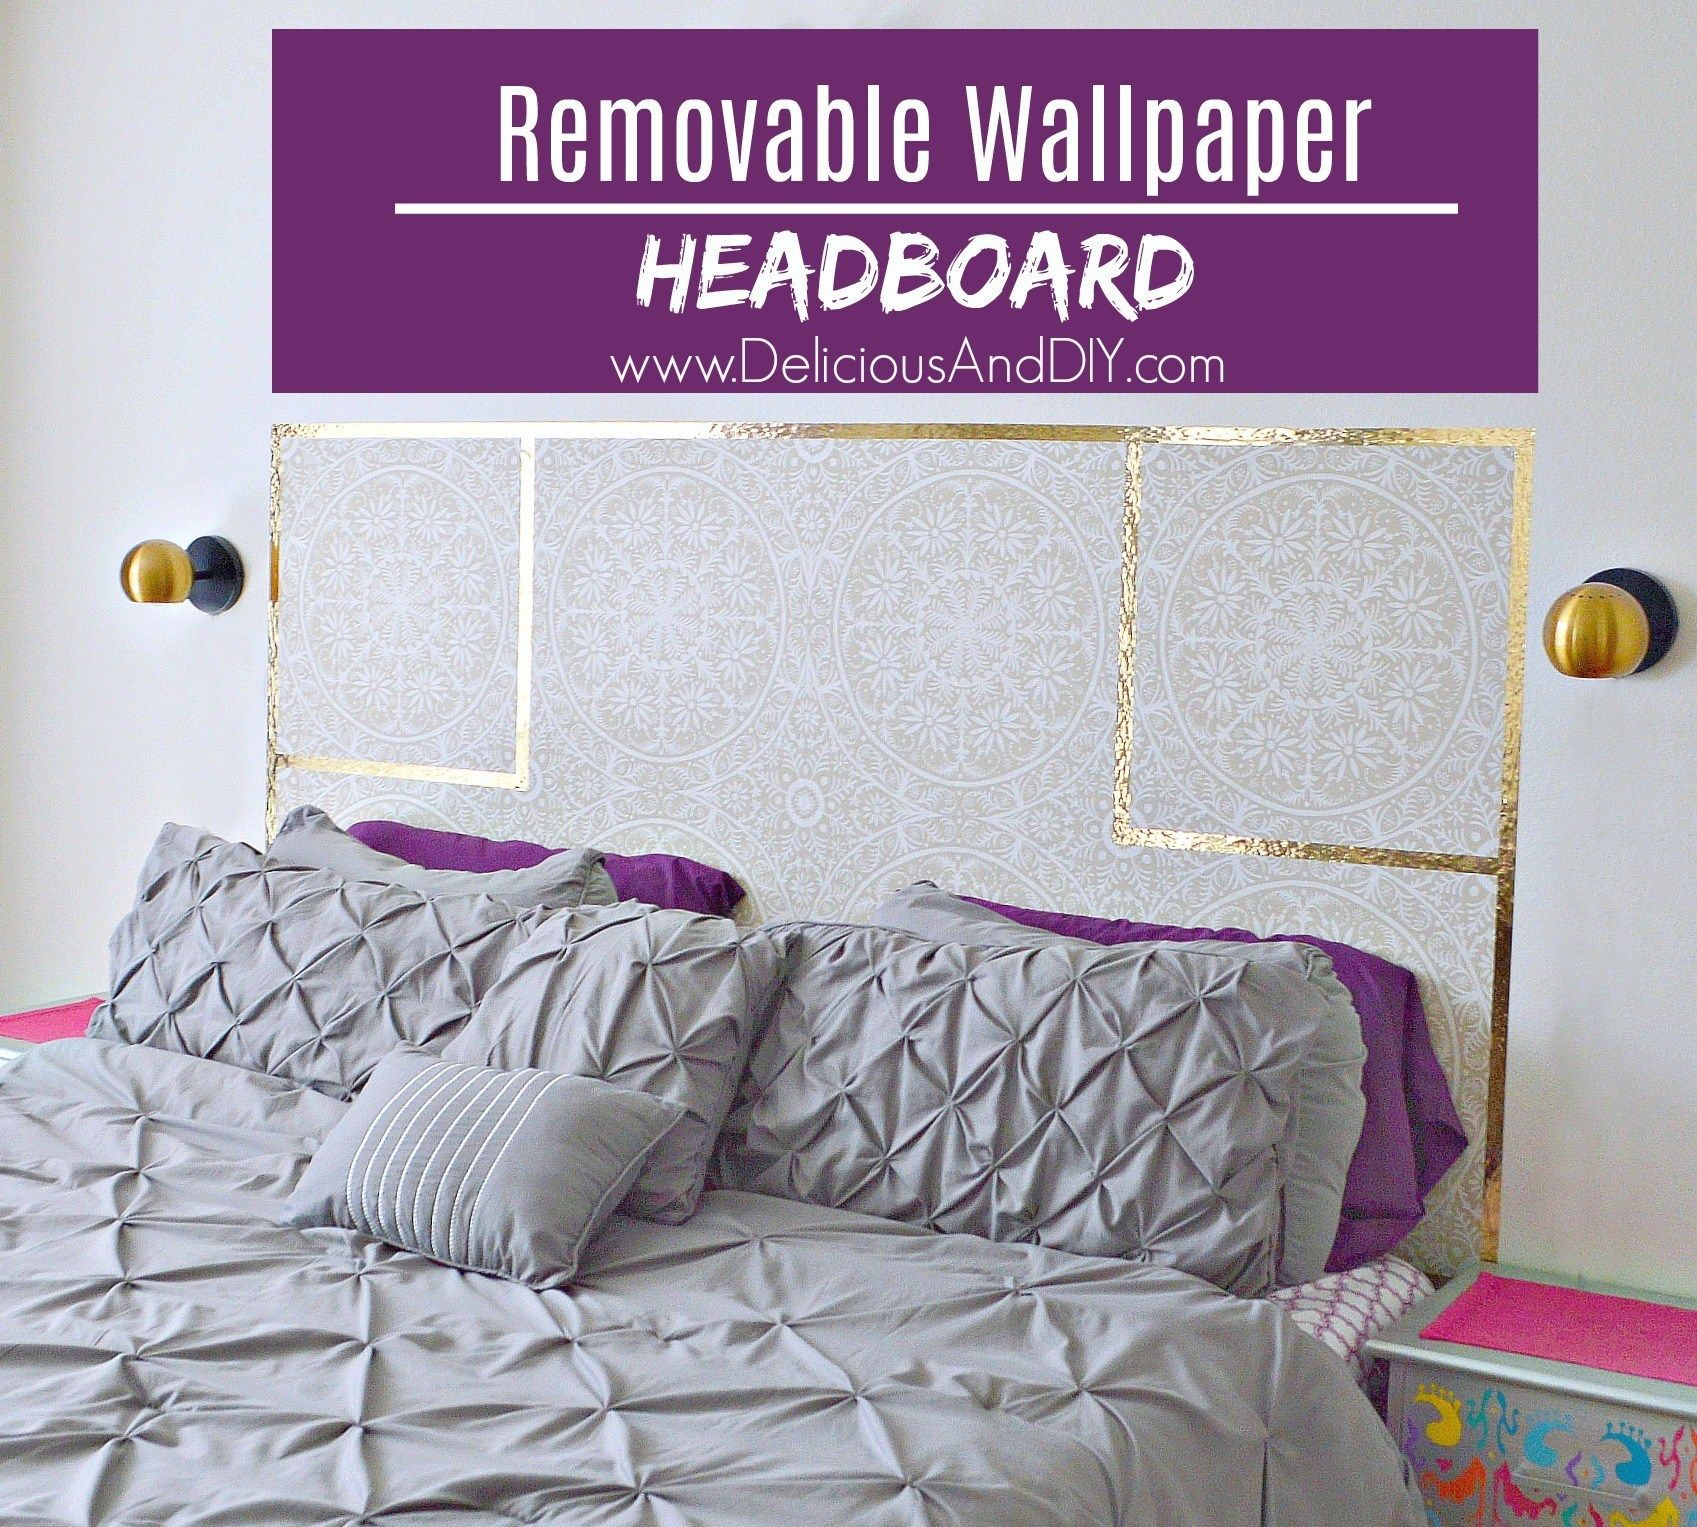 Diy Removable Wallpaper Headboard Delicious And Diy Wallpaper Headboard Diy Wallpaper Headboard Rental Home Decor